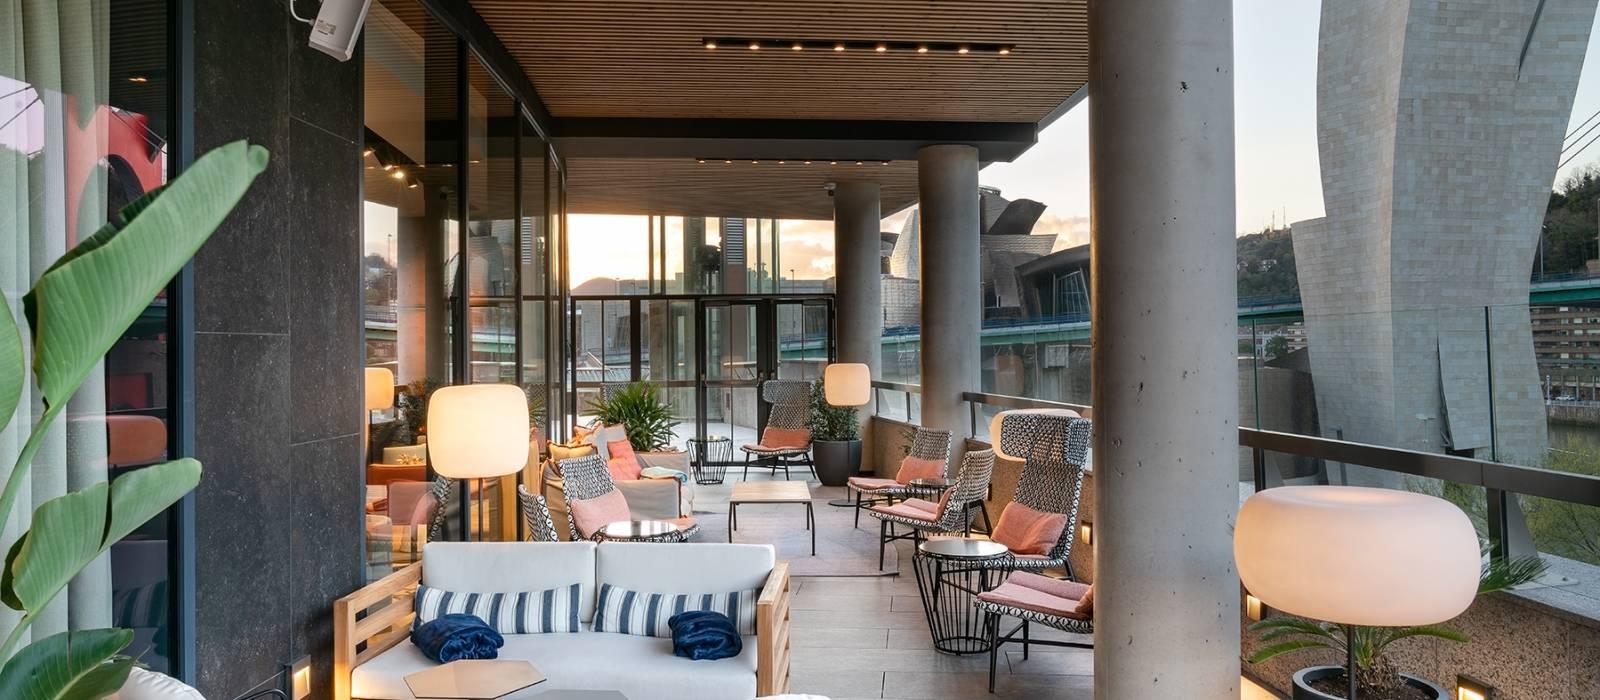 Hotel Vincci Consulado de Bilbao Terrasse